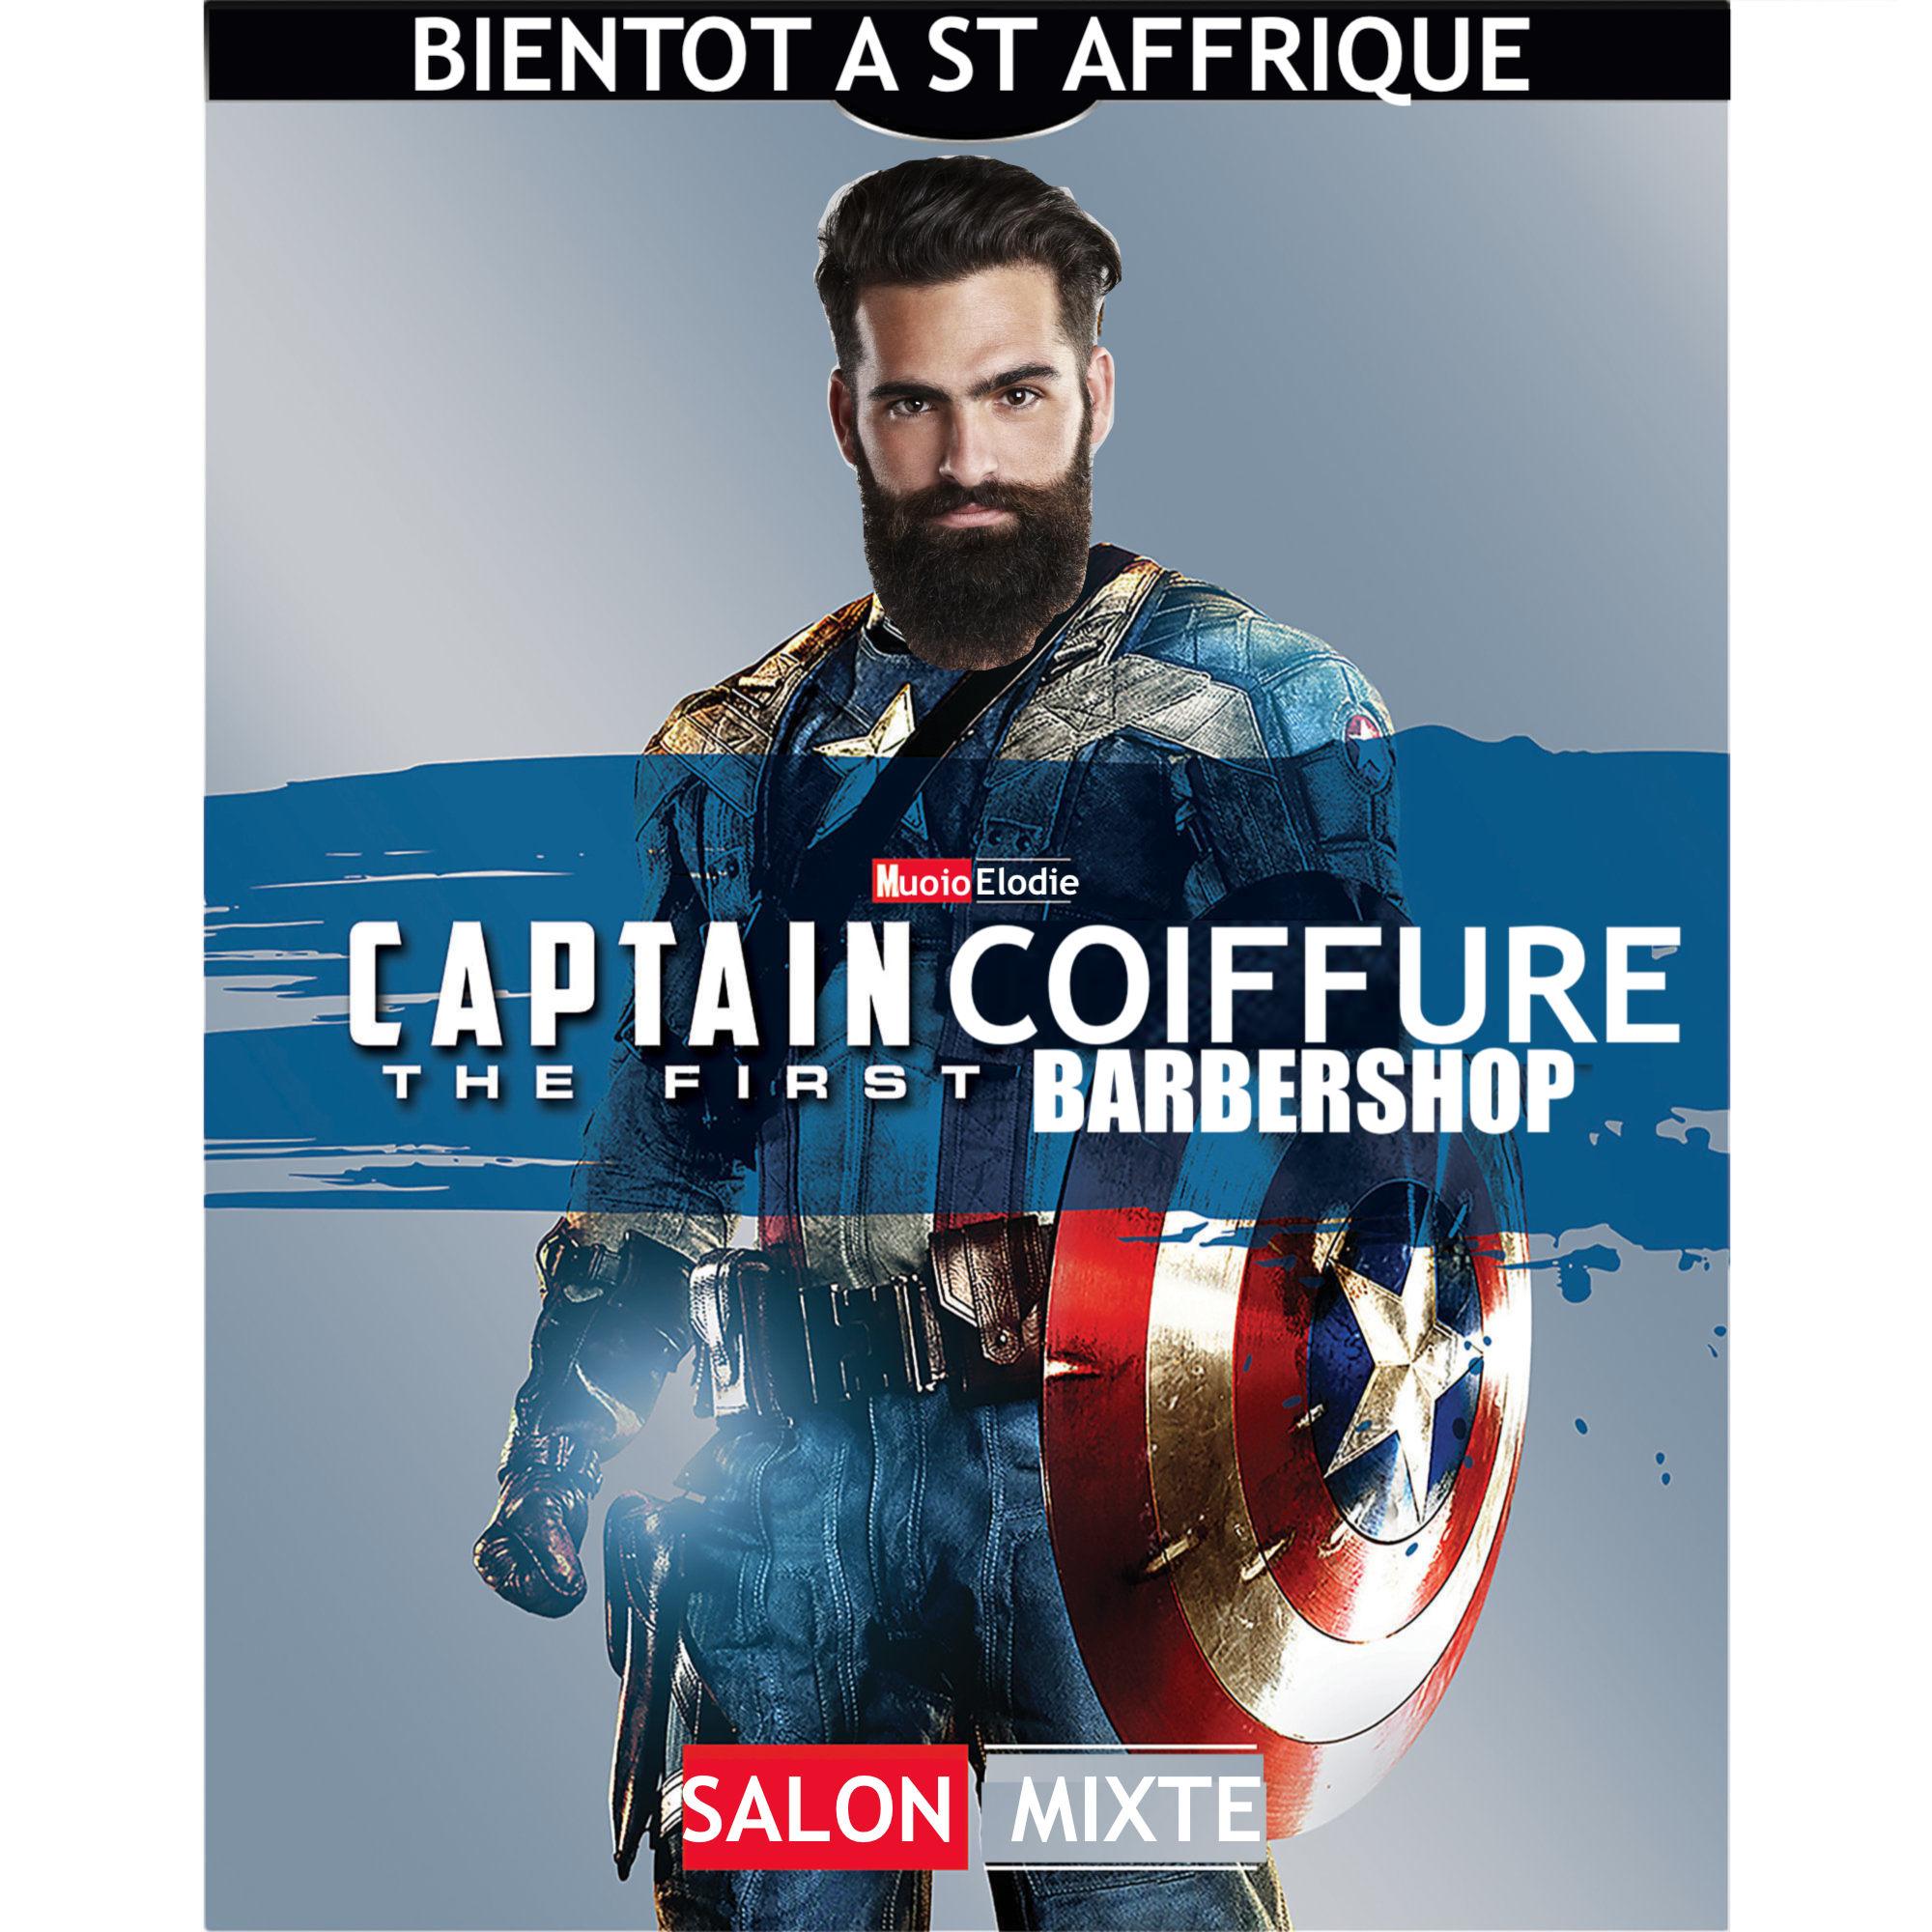 https://storage.googleapis.com/bsiflexyprod/captain-coiffure/images/background/5649050225344512.jpg